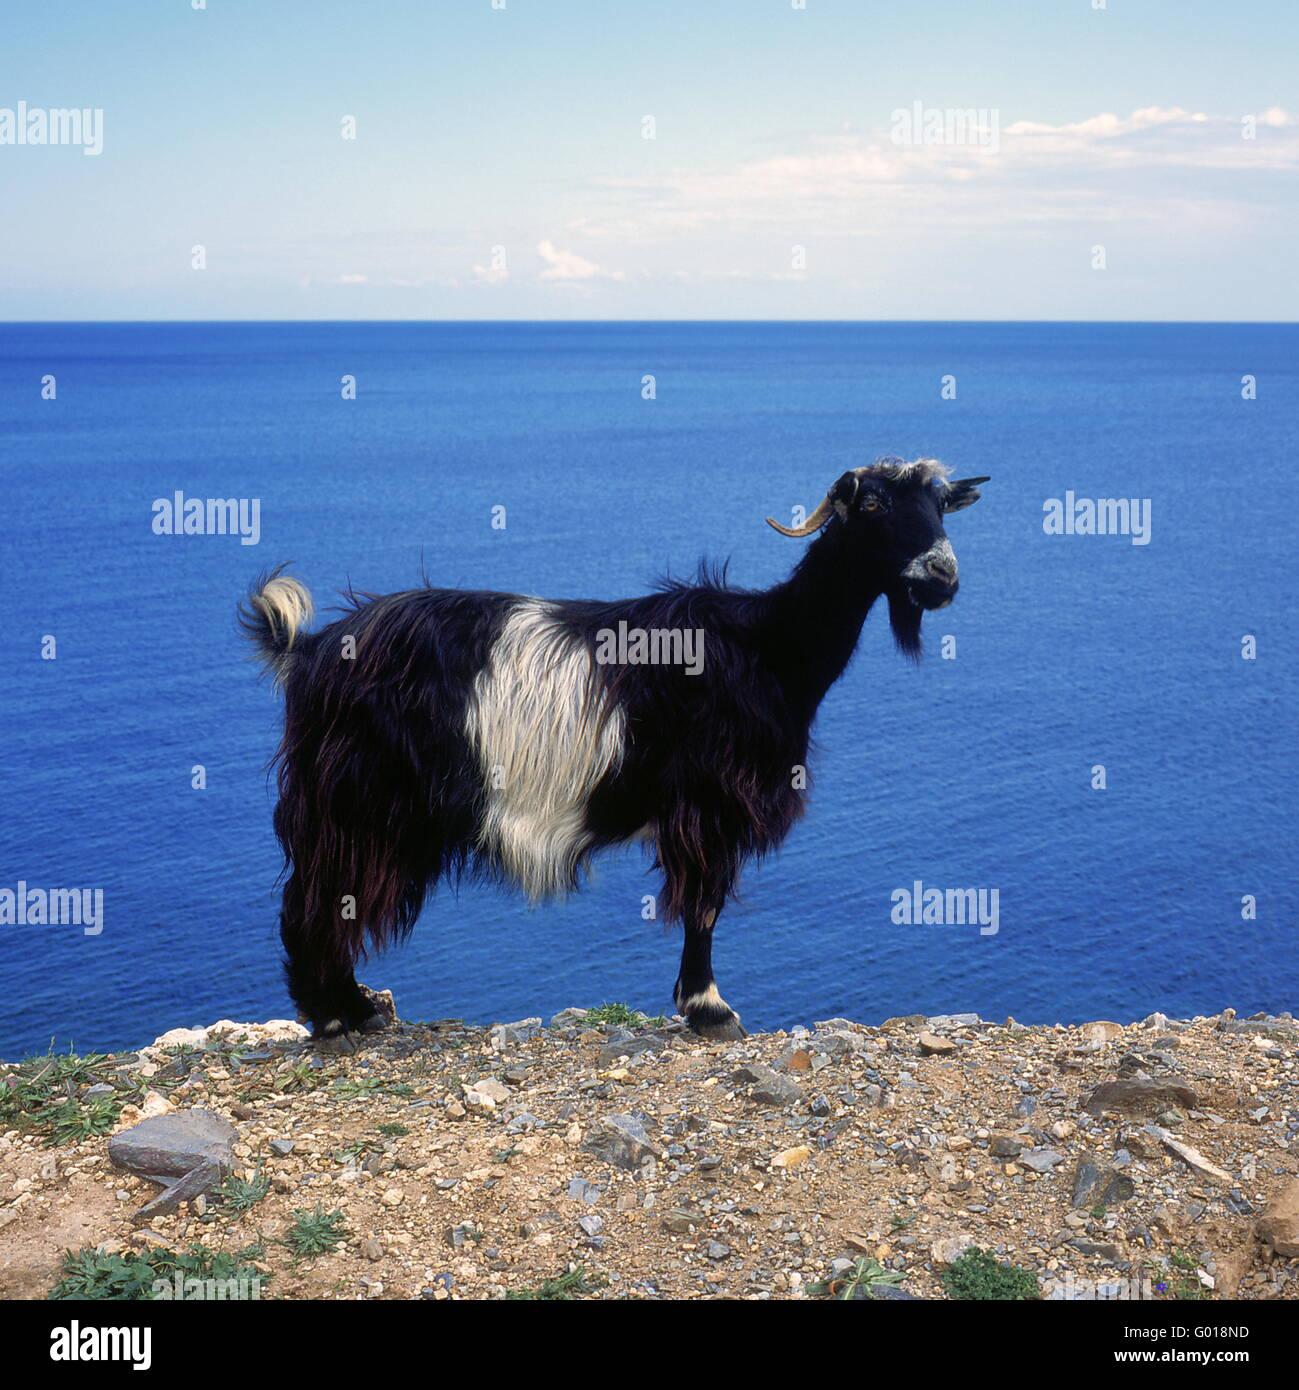 greek gaat at the beach of Crete Island, Greece, - Stock Image